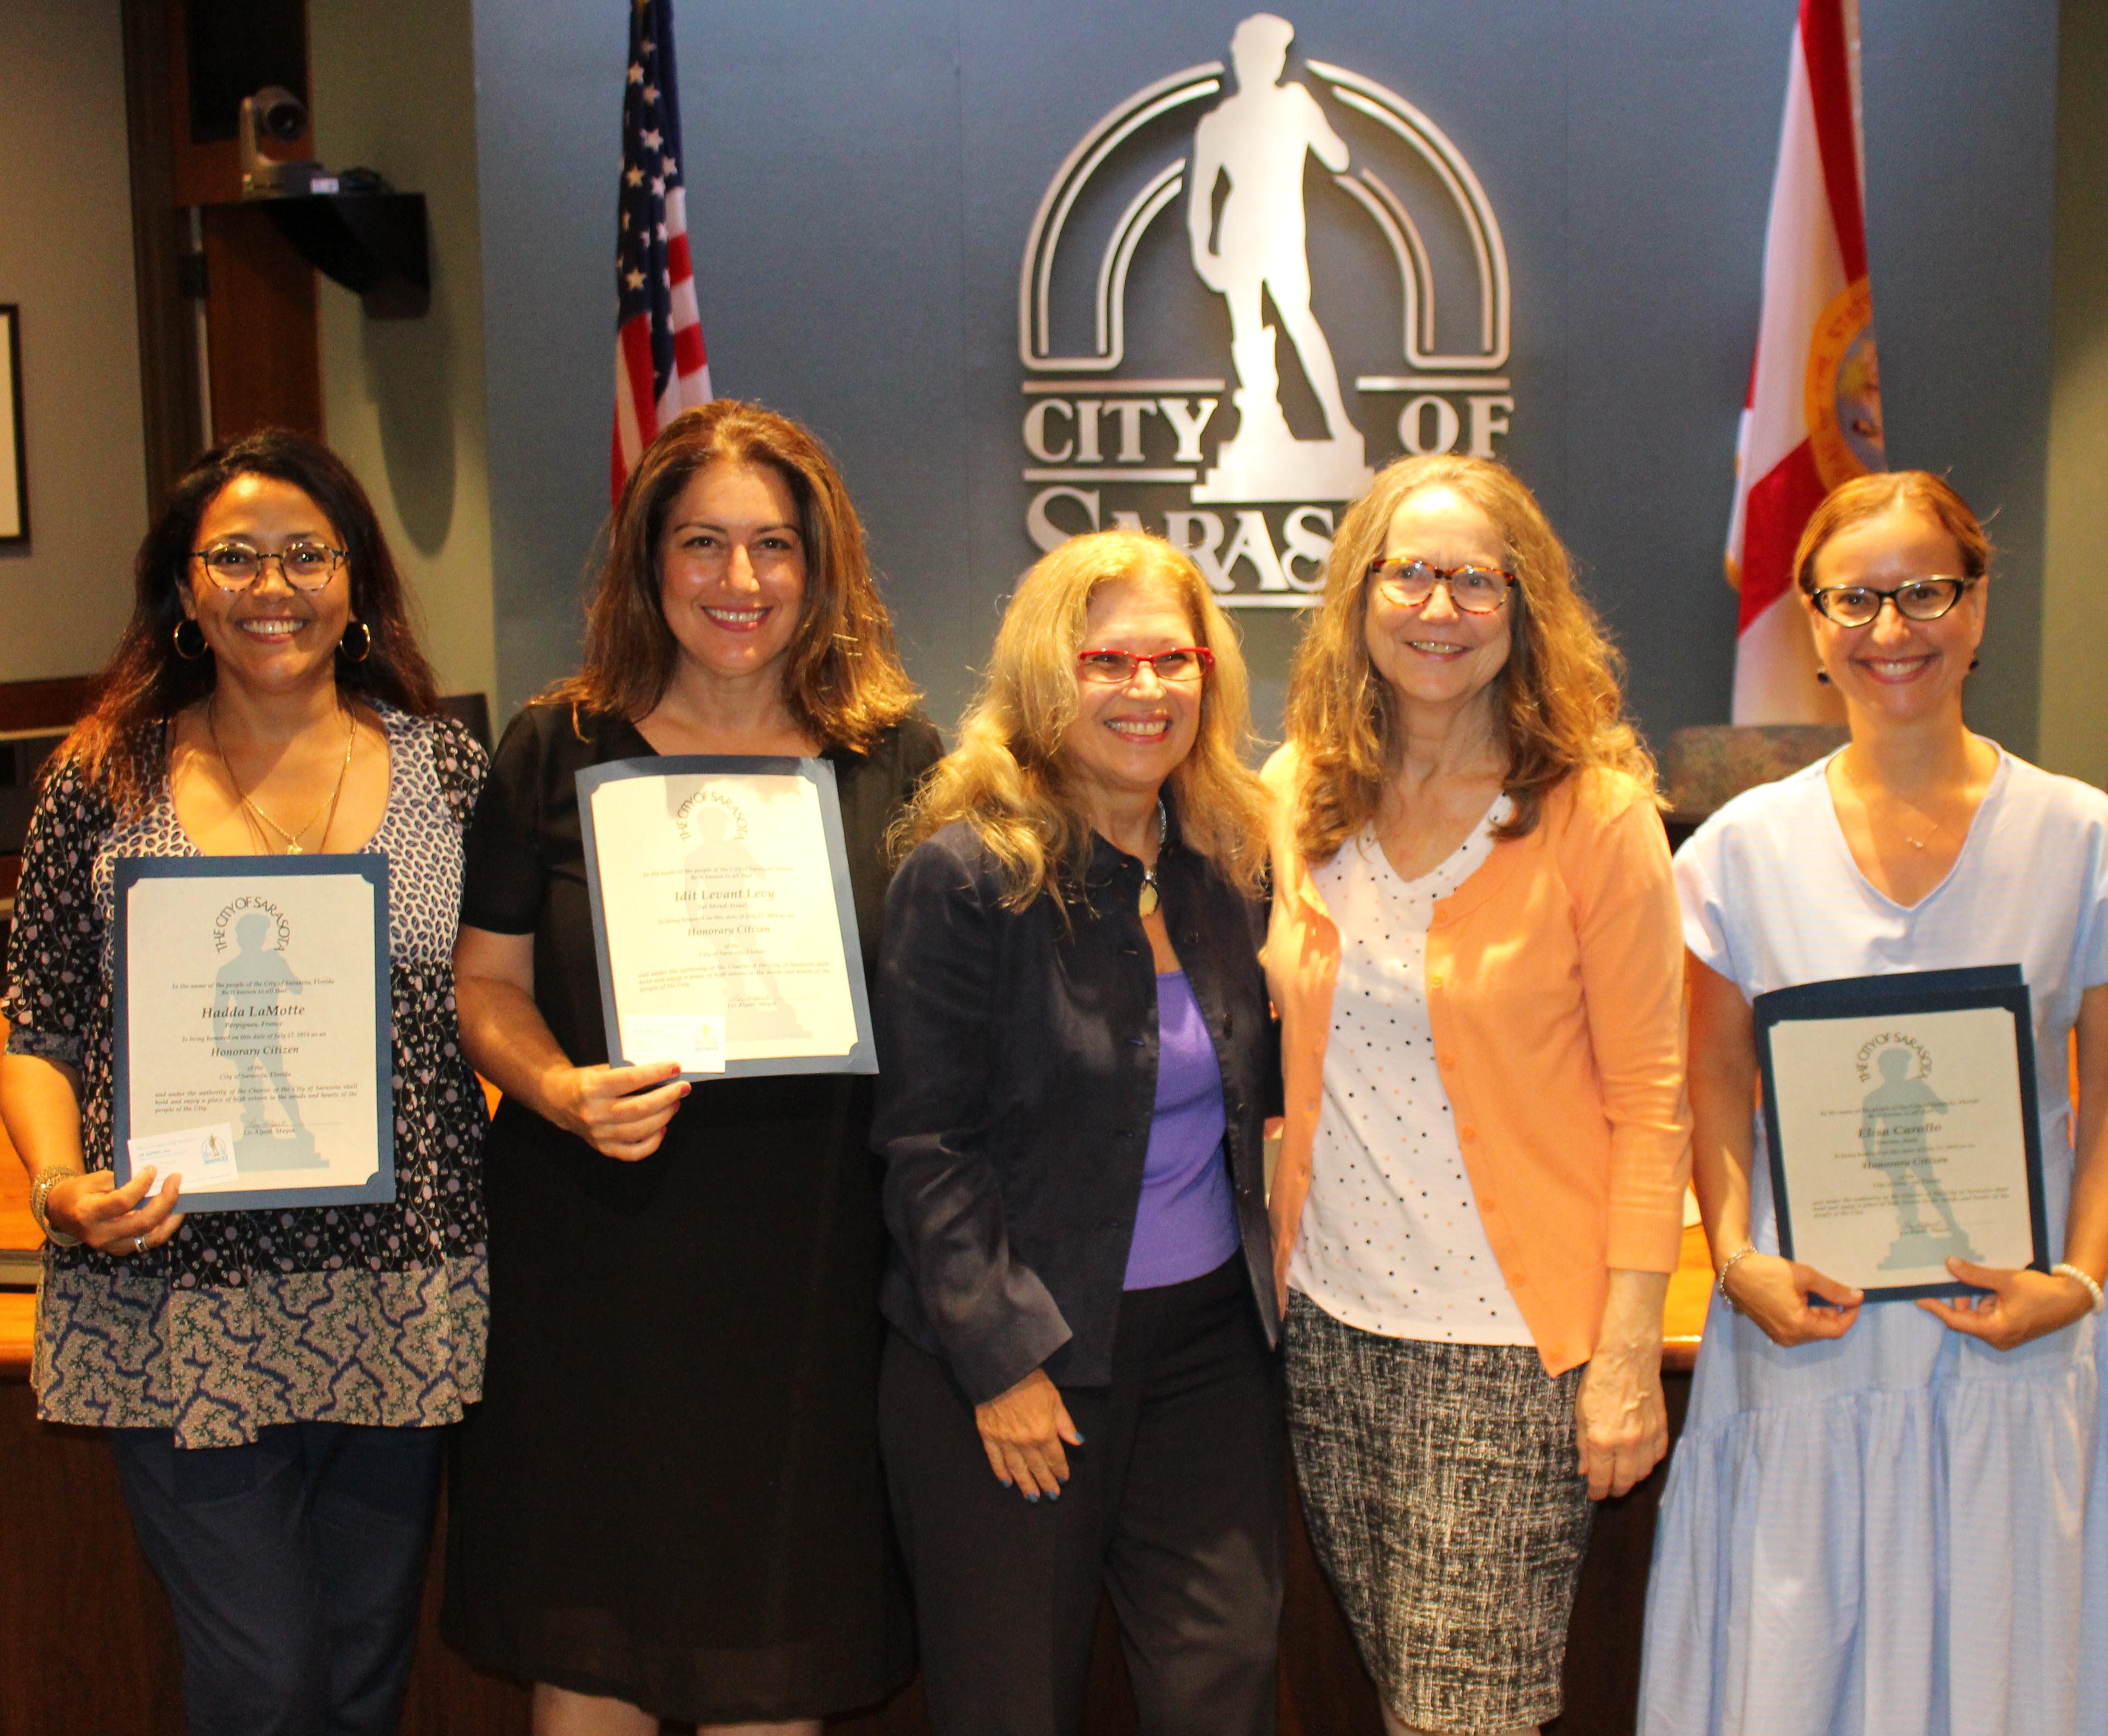 Sister Cities teachers, here in the U.S. on behalf of the Sister Cities Association of Sarasota, pose with Sarasota Mayor Liz Albert